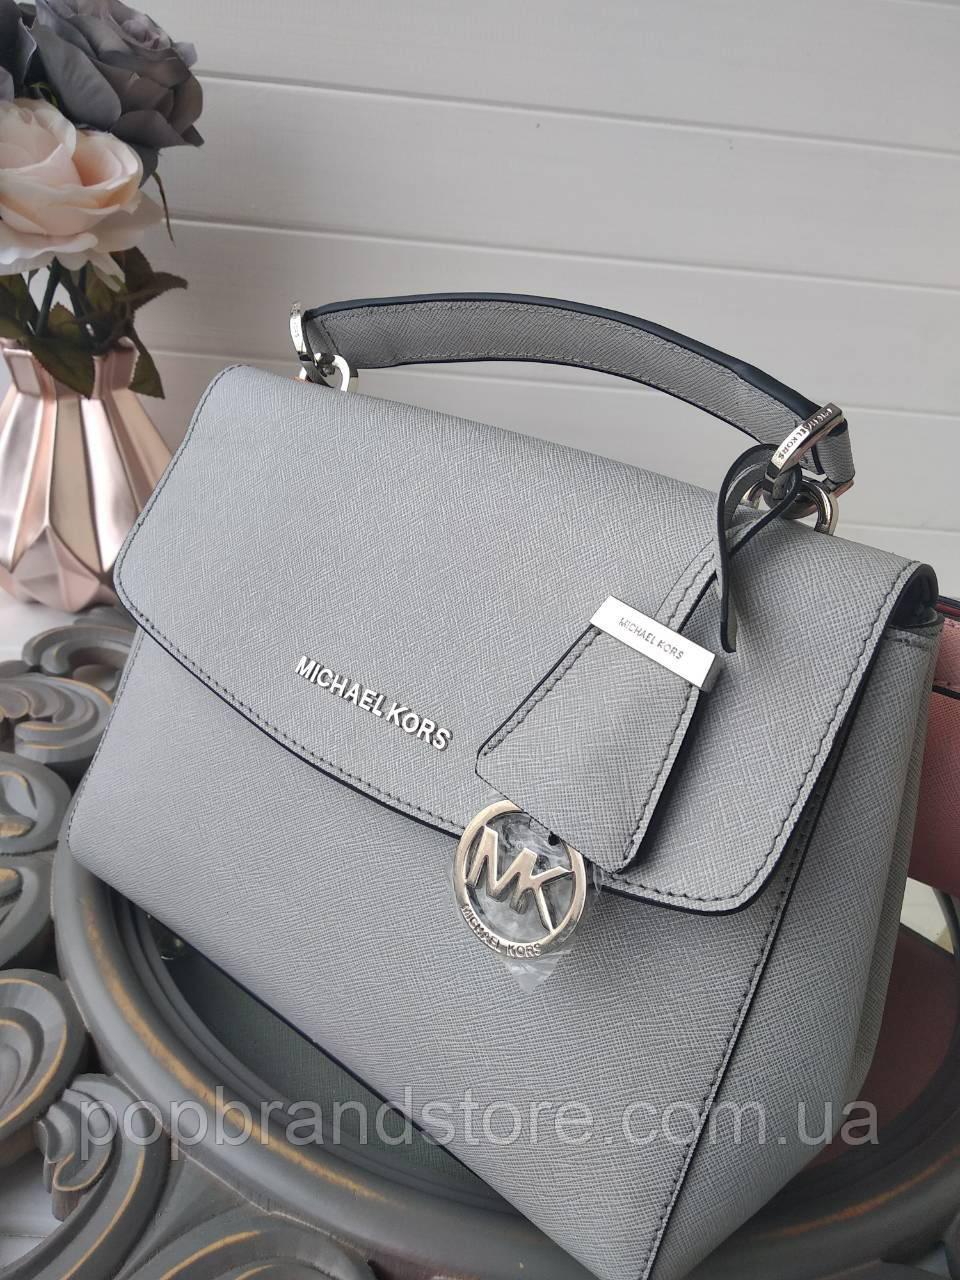 82bbf069a647 Женская сумка через плечо Michael Kors Ava 25 см (реплика) - Pop Brand Store